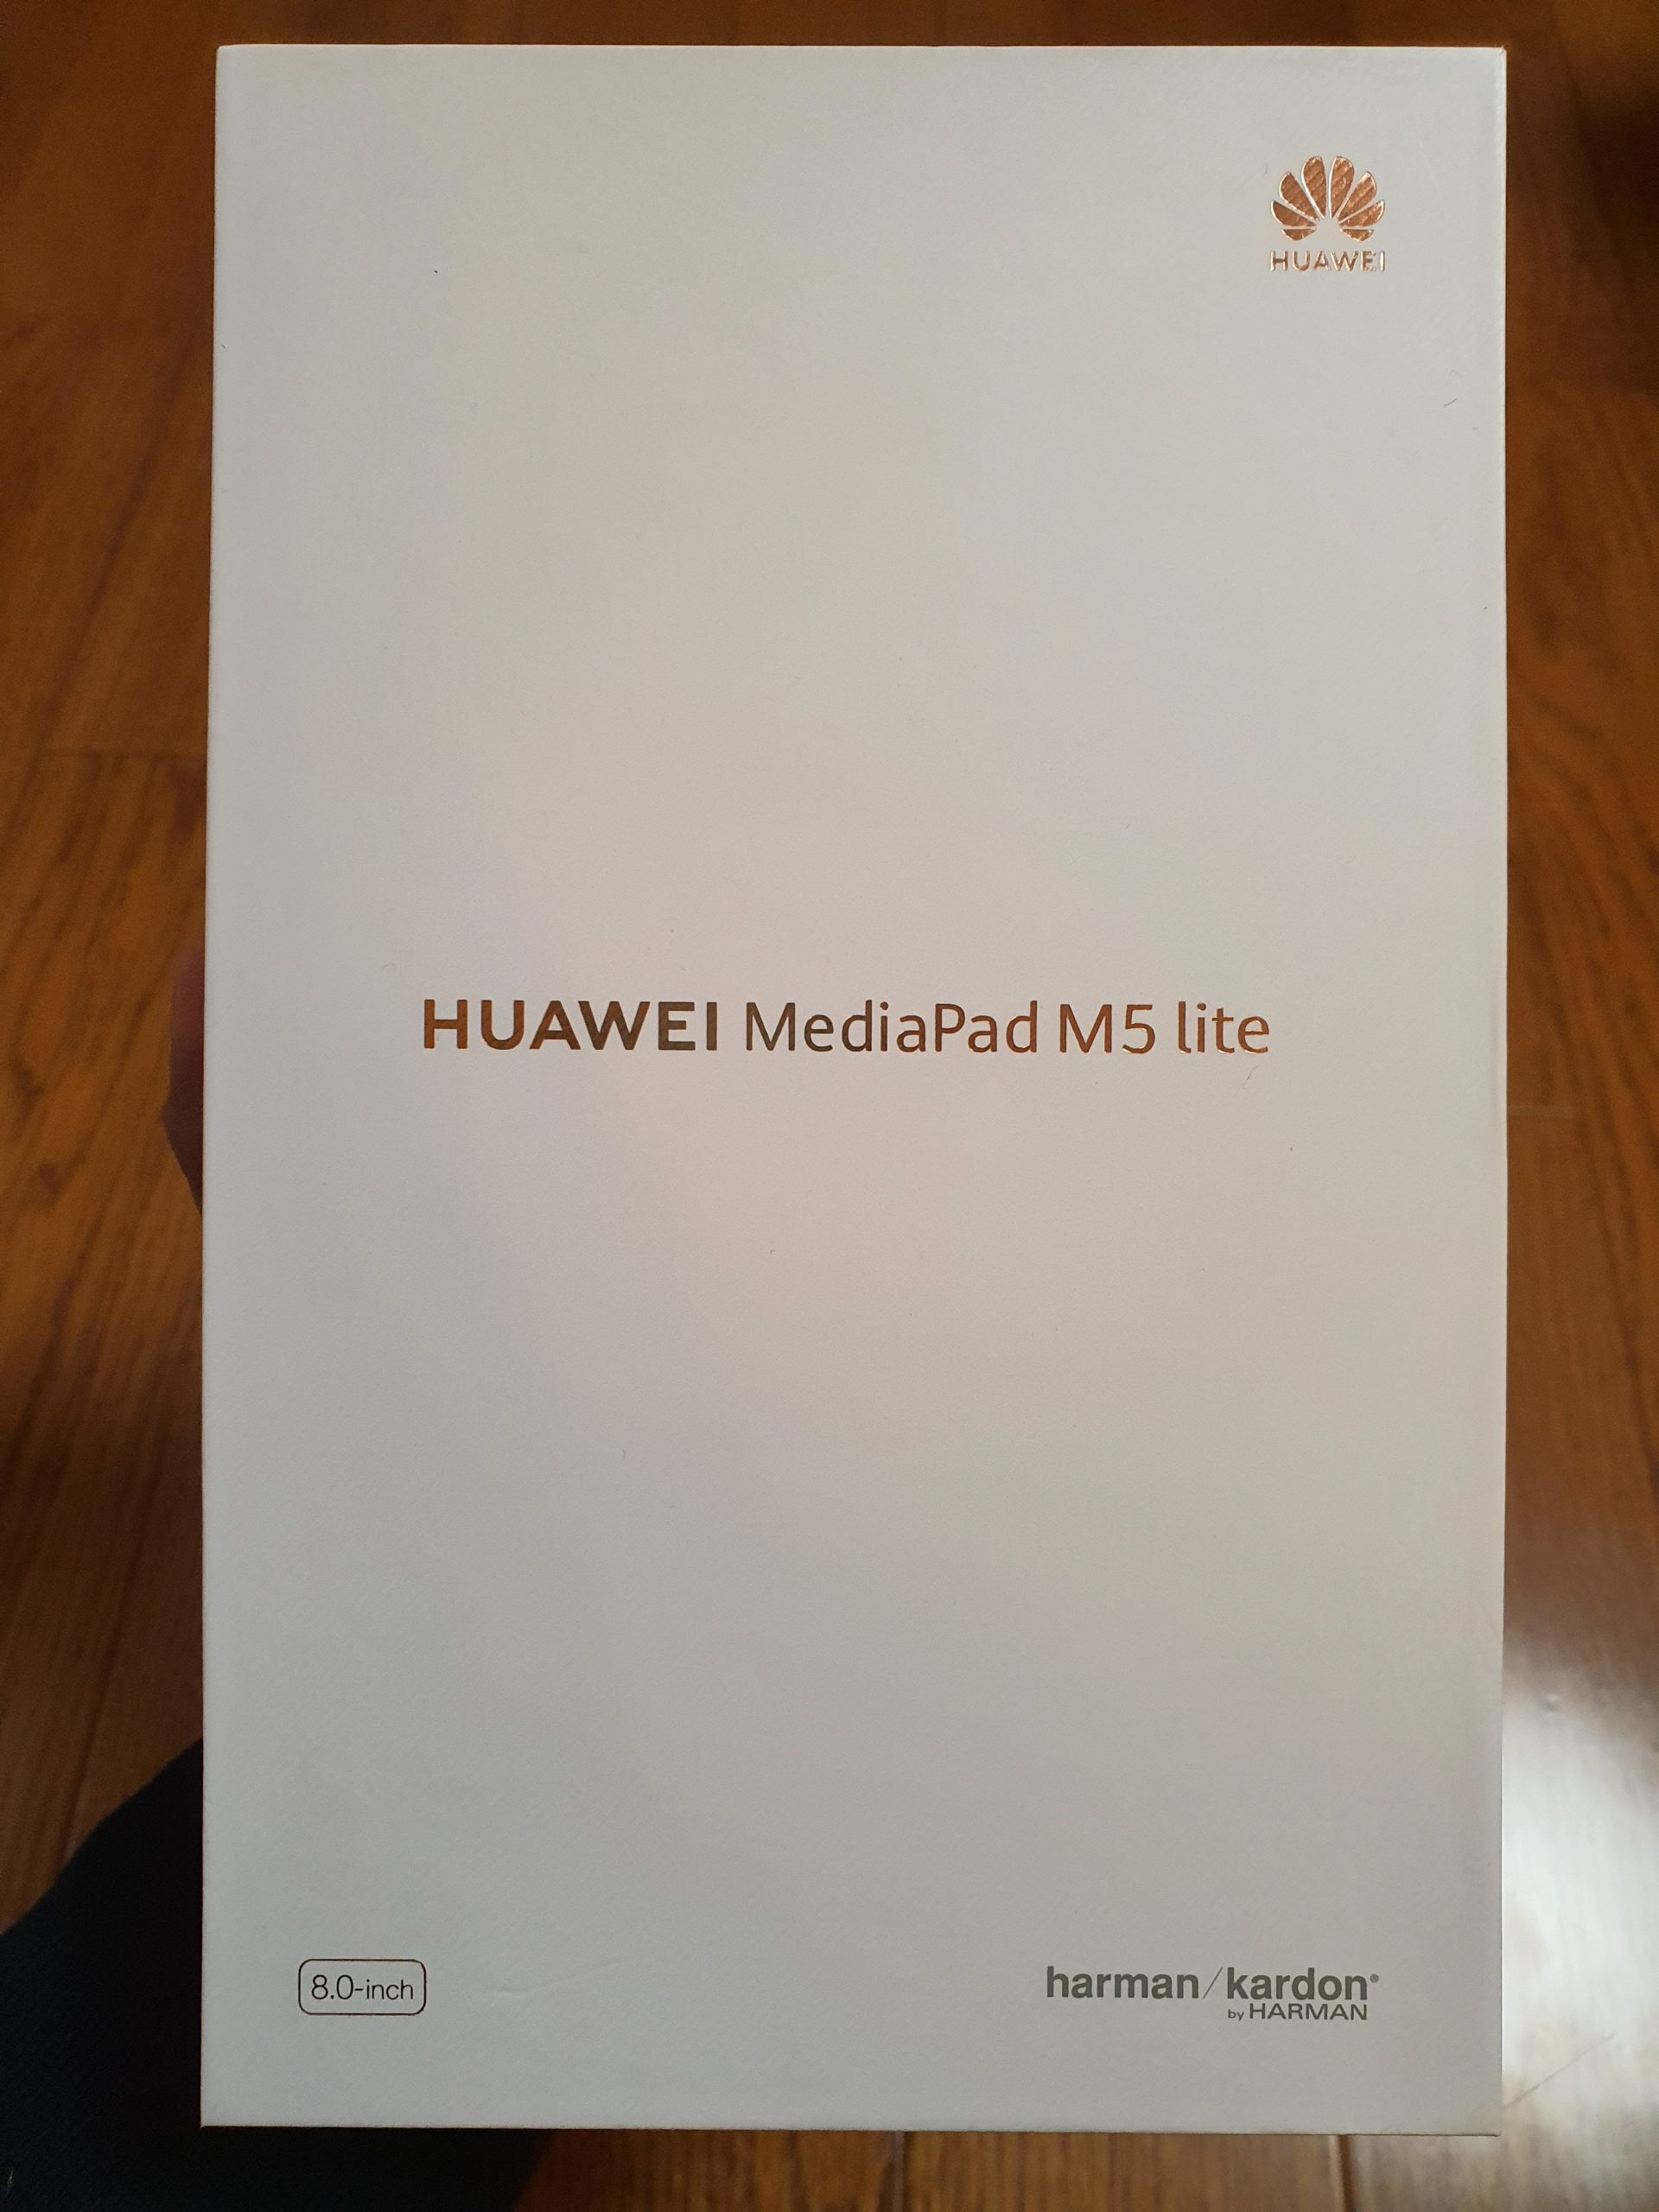 Huawei MediaPadM5 lite (lte)を買いました♪